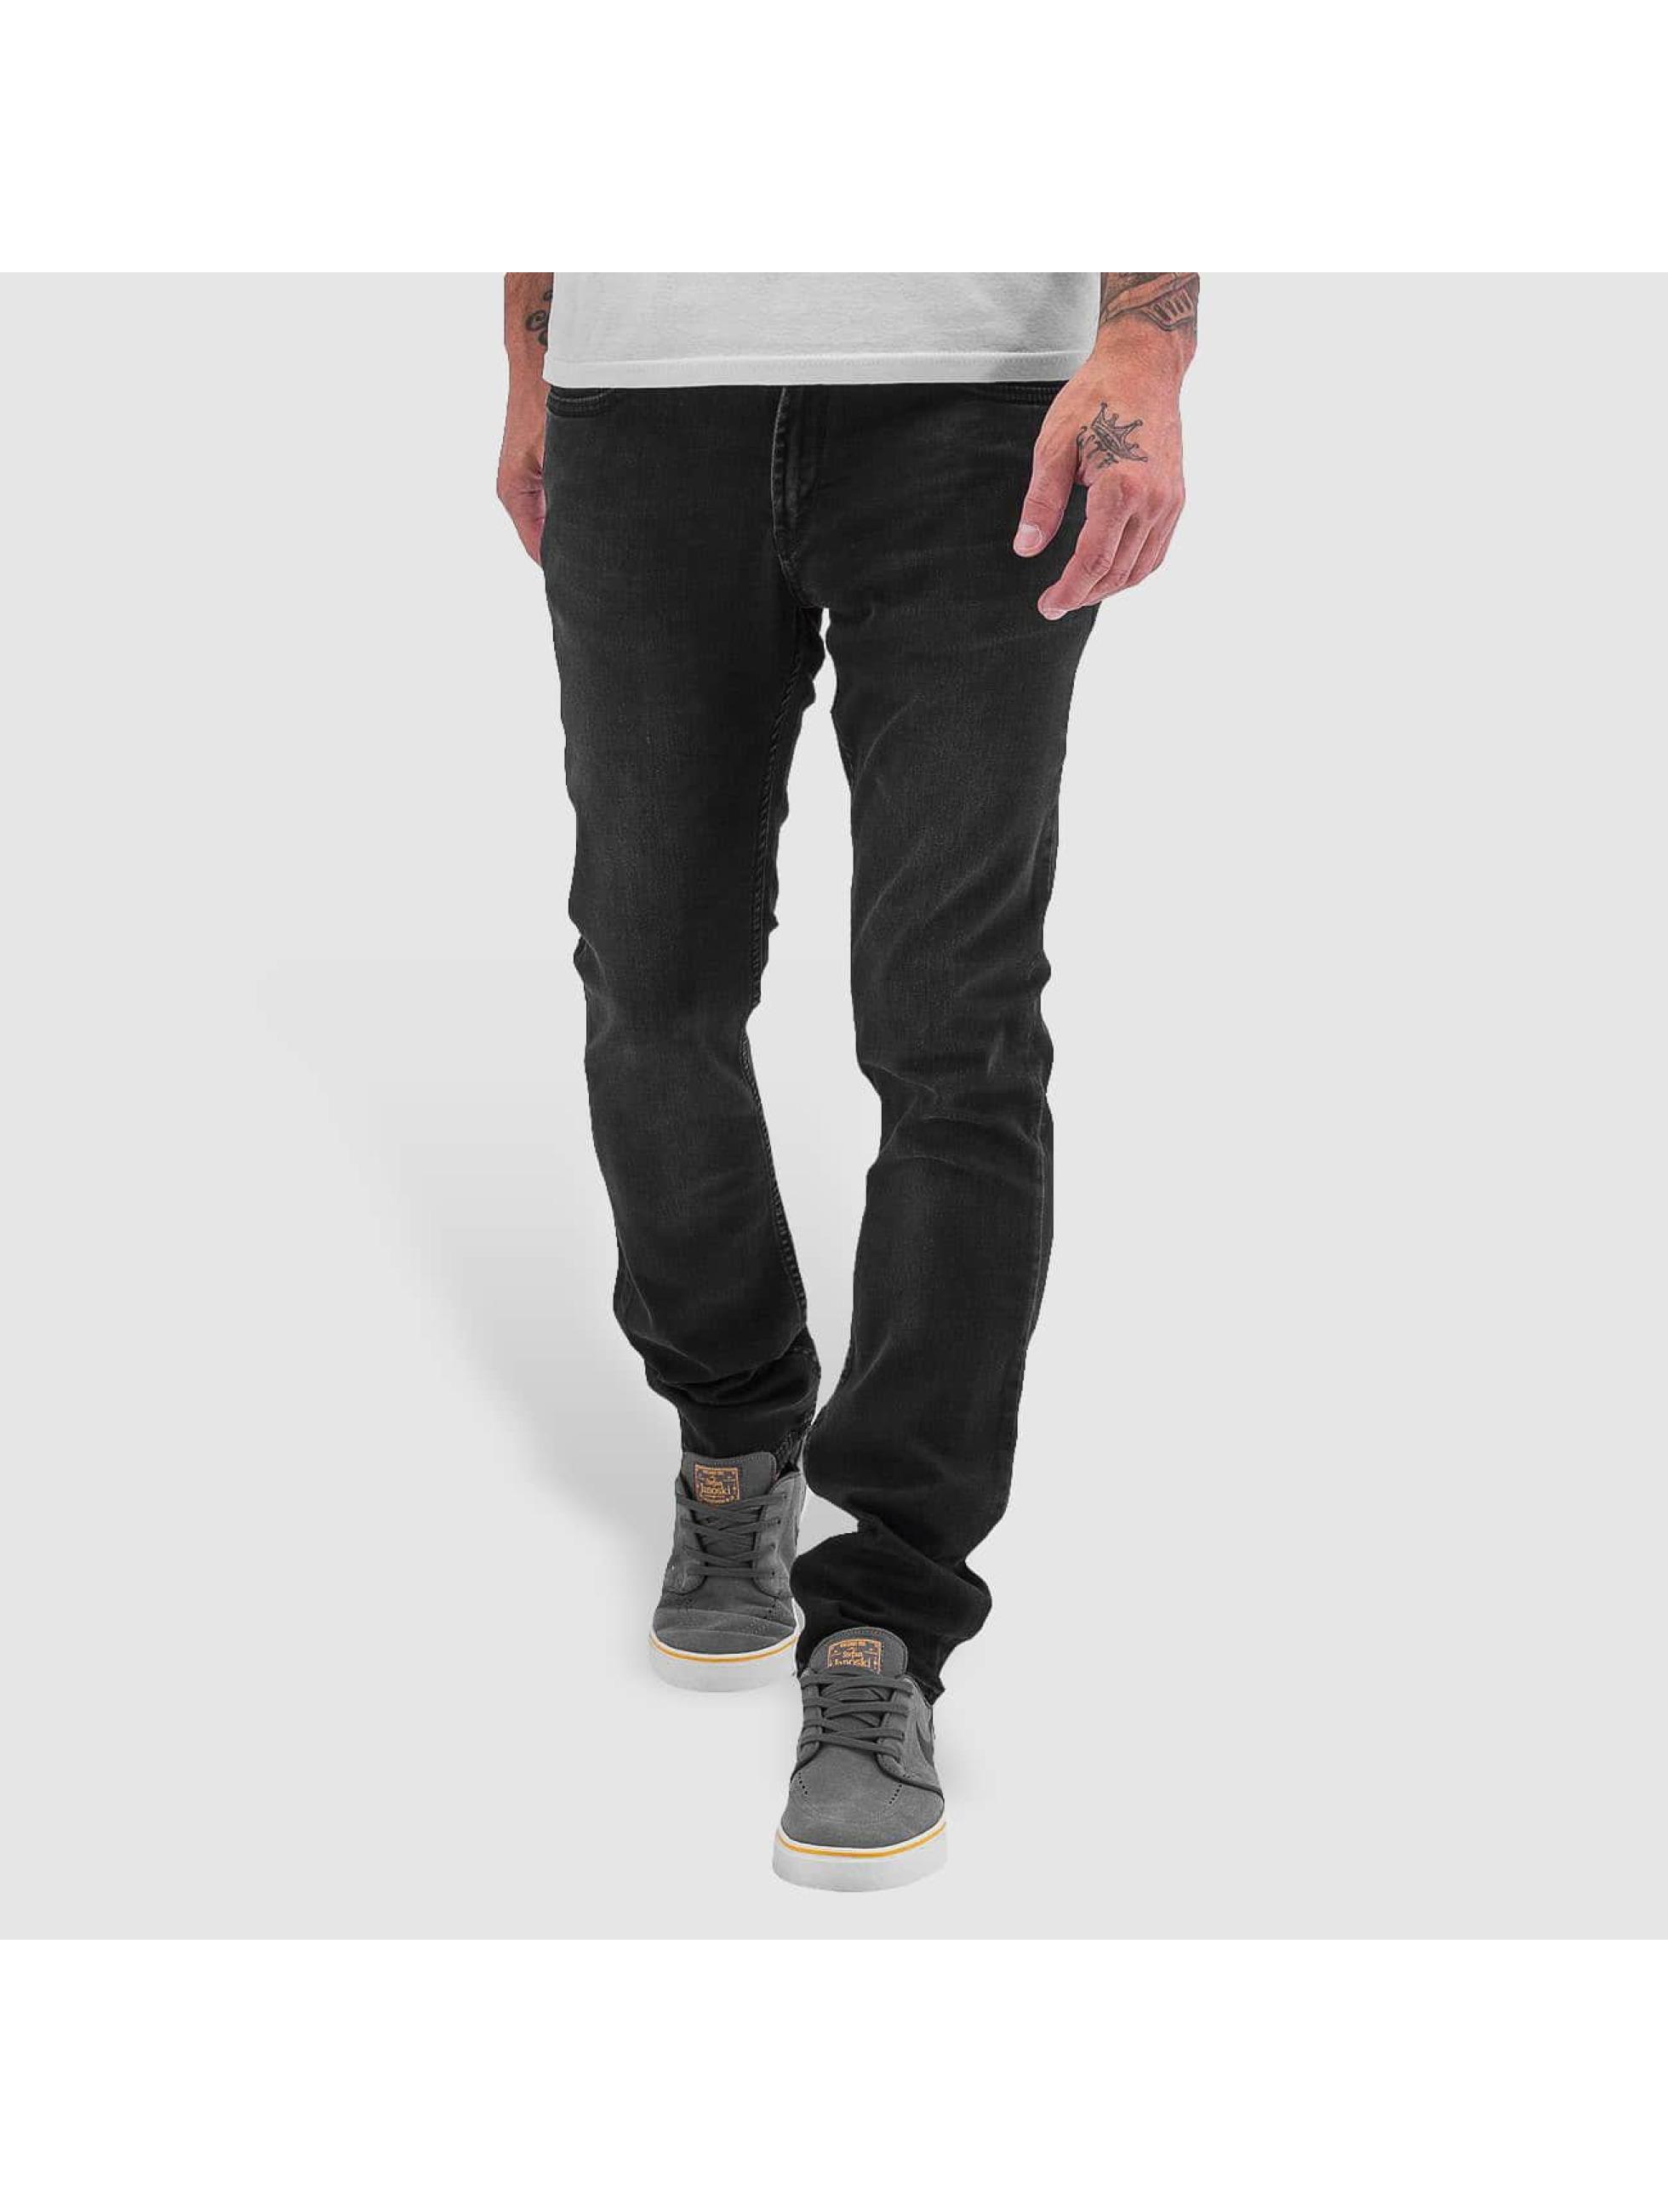 Reell Jeans Jean coupe droite Trigger noir